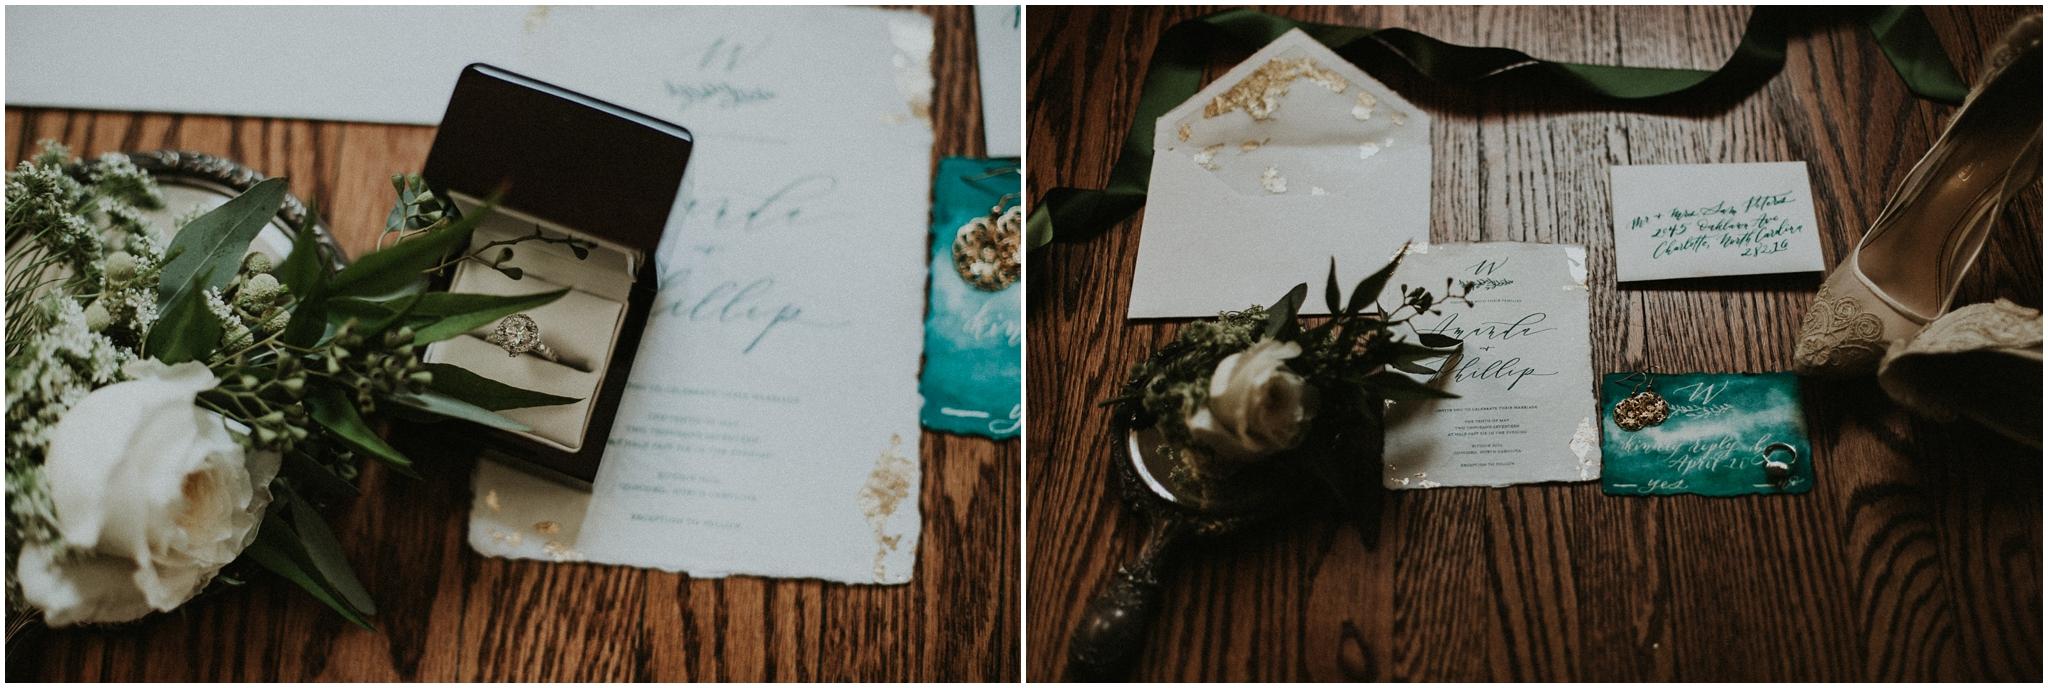 Wedding-photographer-ritchie-hill_0003.jpg